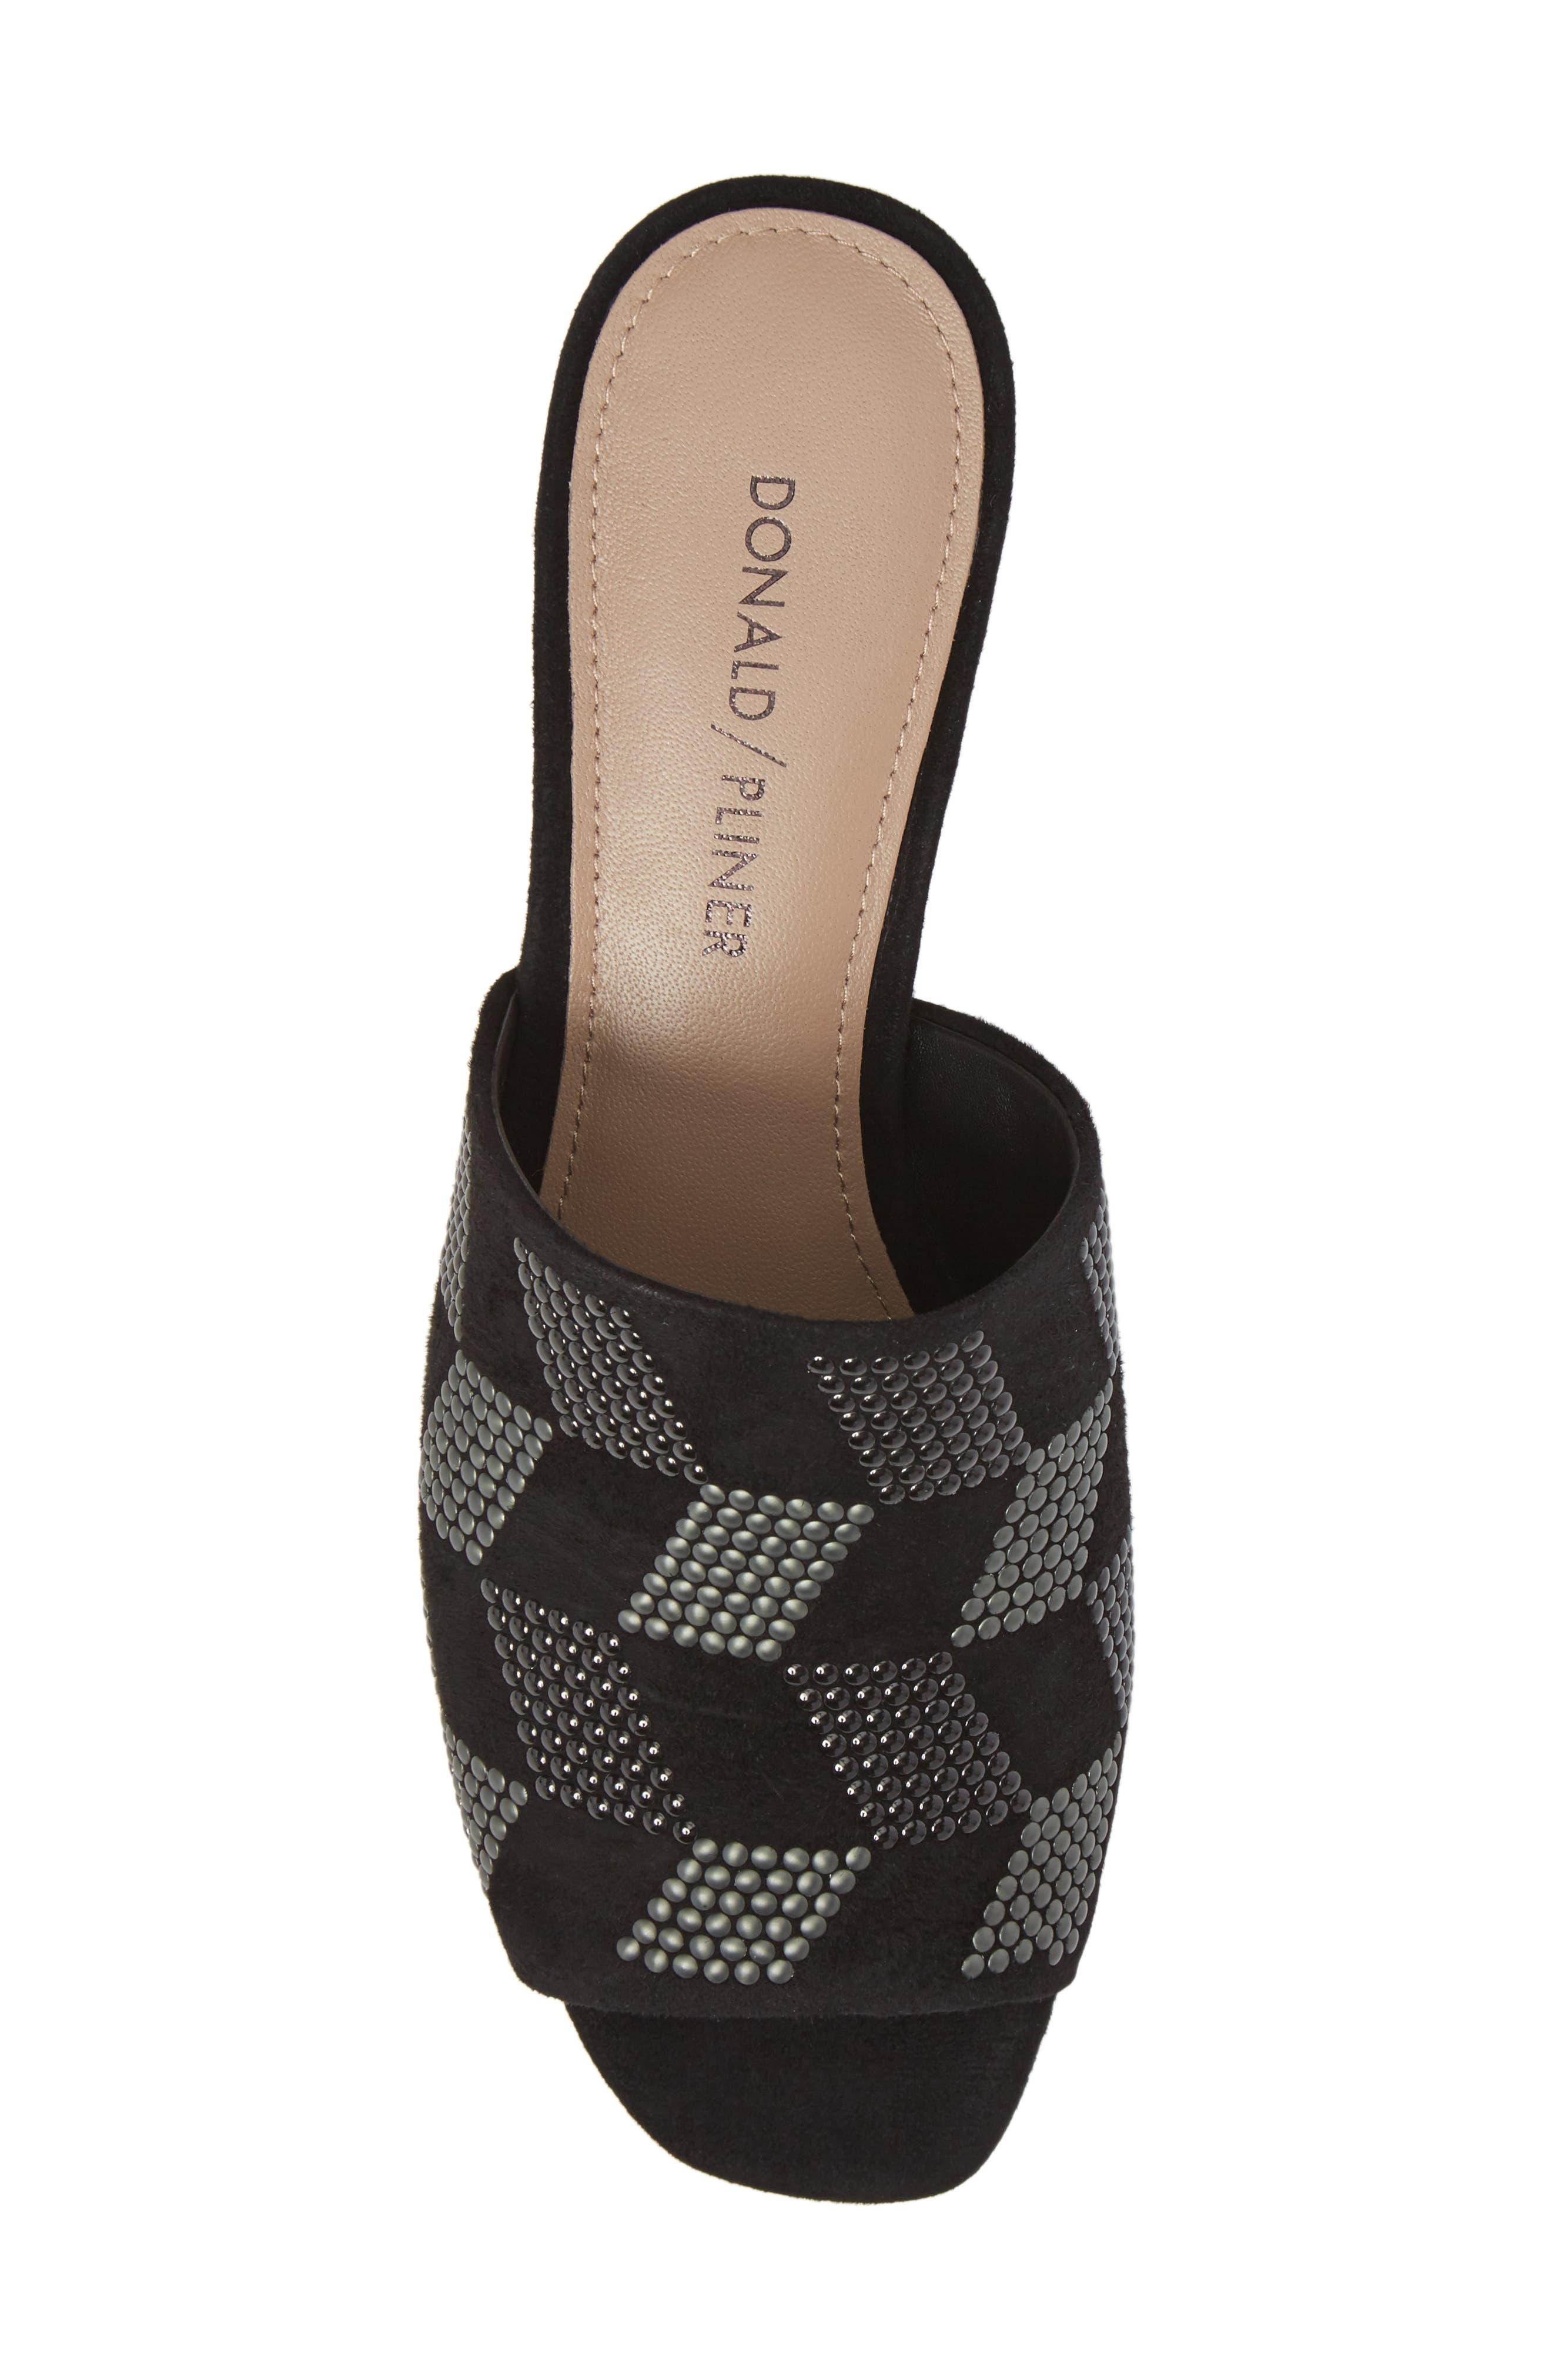 Rimini Slide Sandal,                             Alternate thumbnail 5, color,                             Black Suede